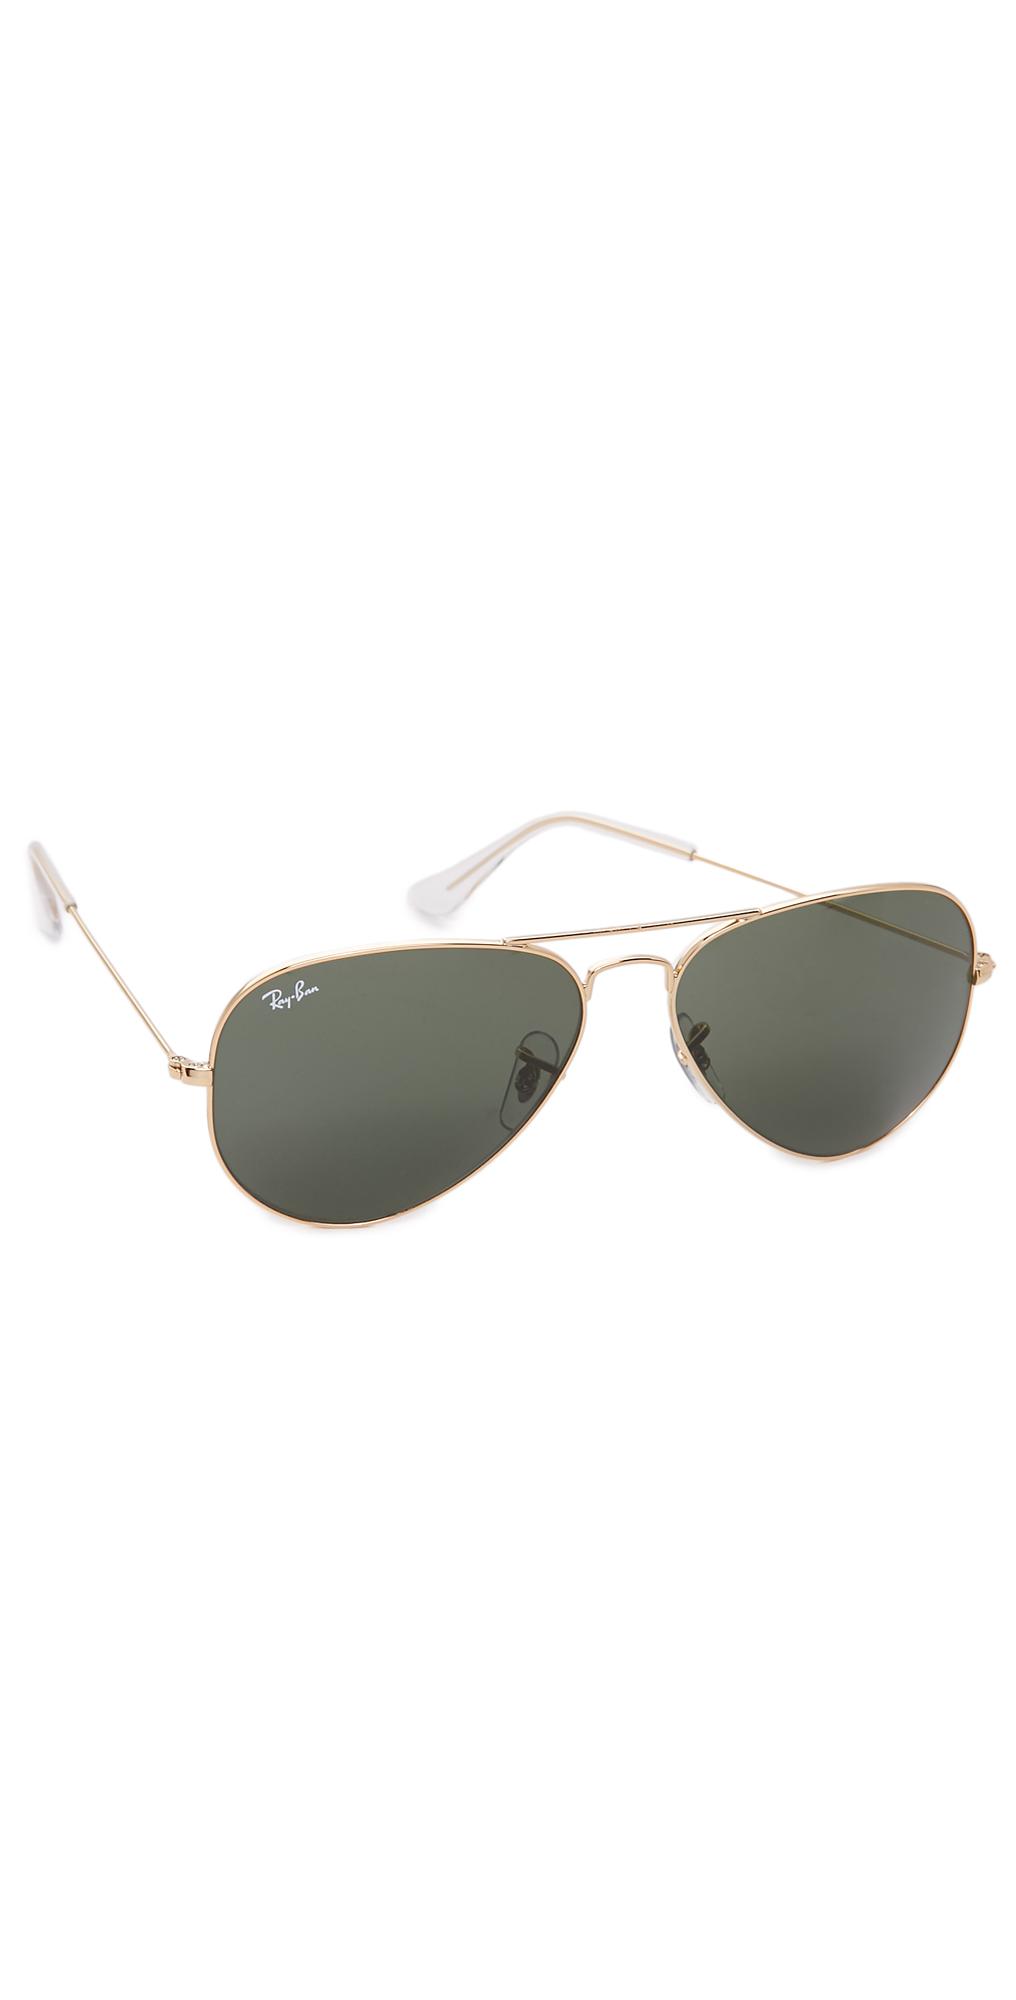 Original Aviator Sunglasses Ray-Ban